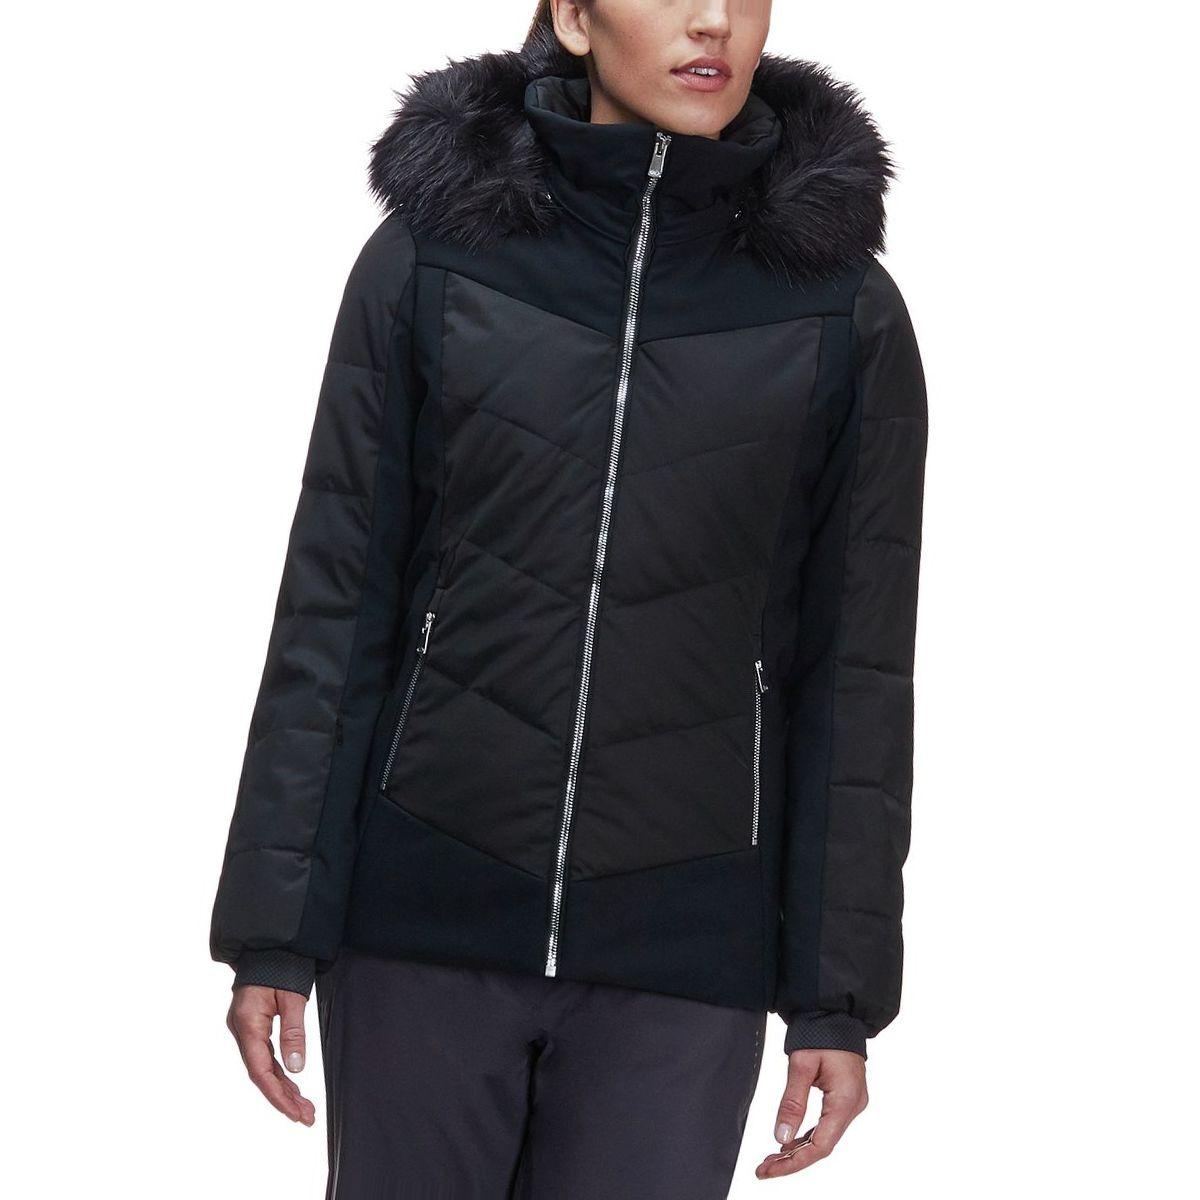 Eider Monterosa Faux Fur 2.0 Jacket - Women's